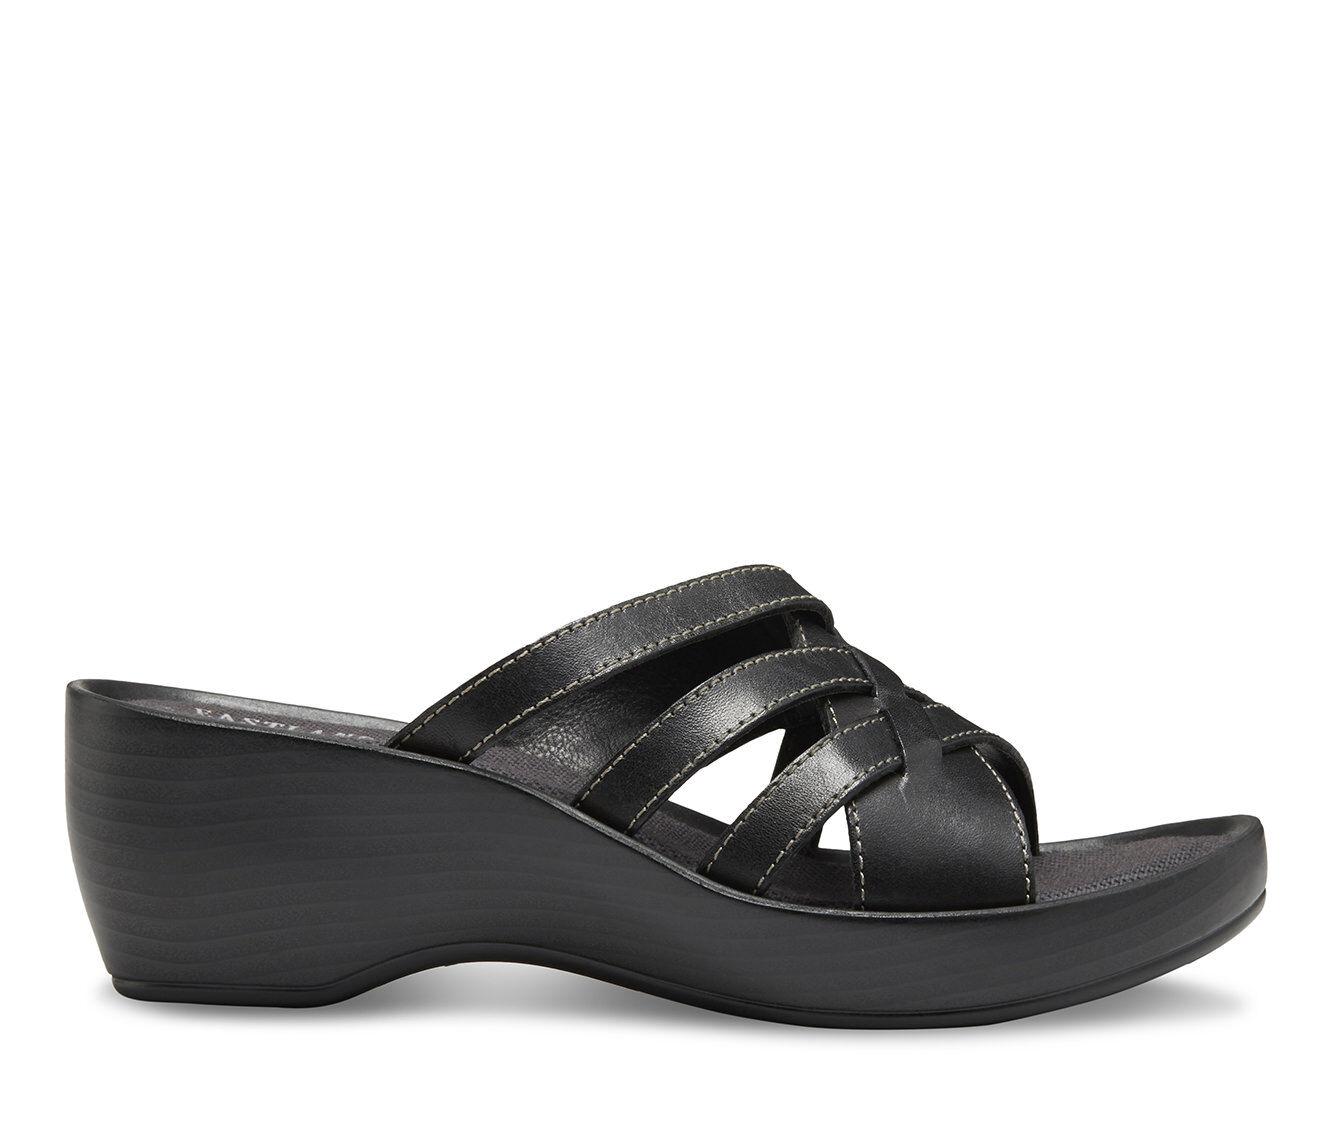 buy authentic Women's Eastland Poppy Sandals Black